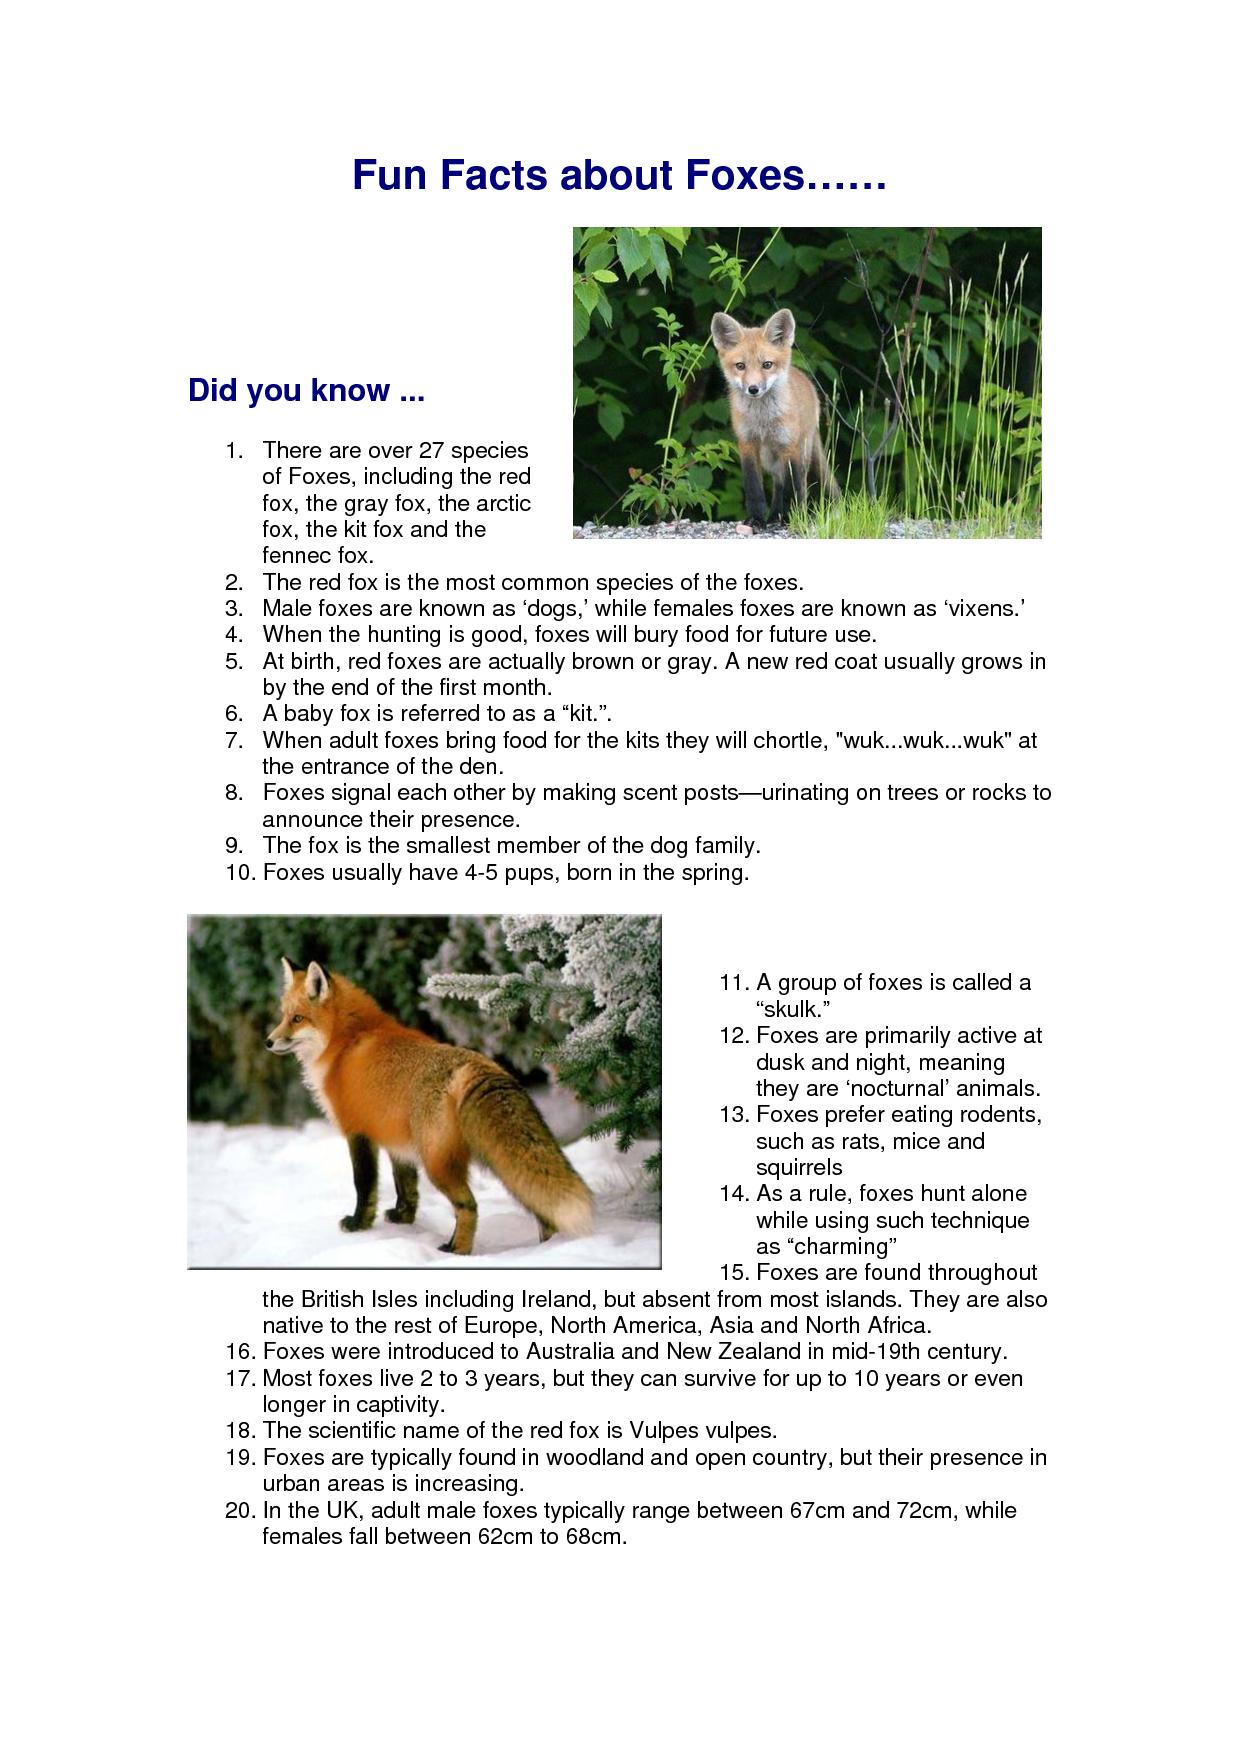 Red Fox Fun Facts Fun facts, Fox facts, Red fox